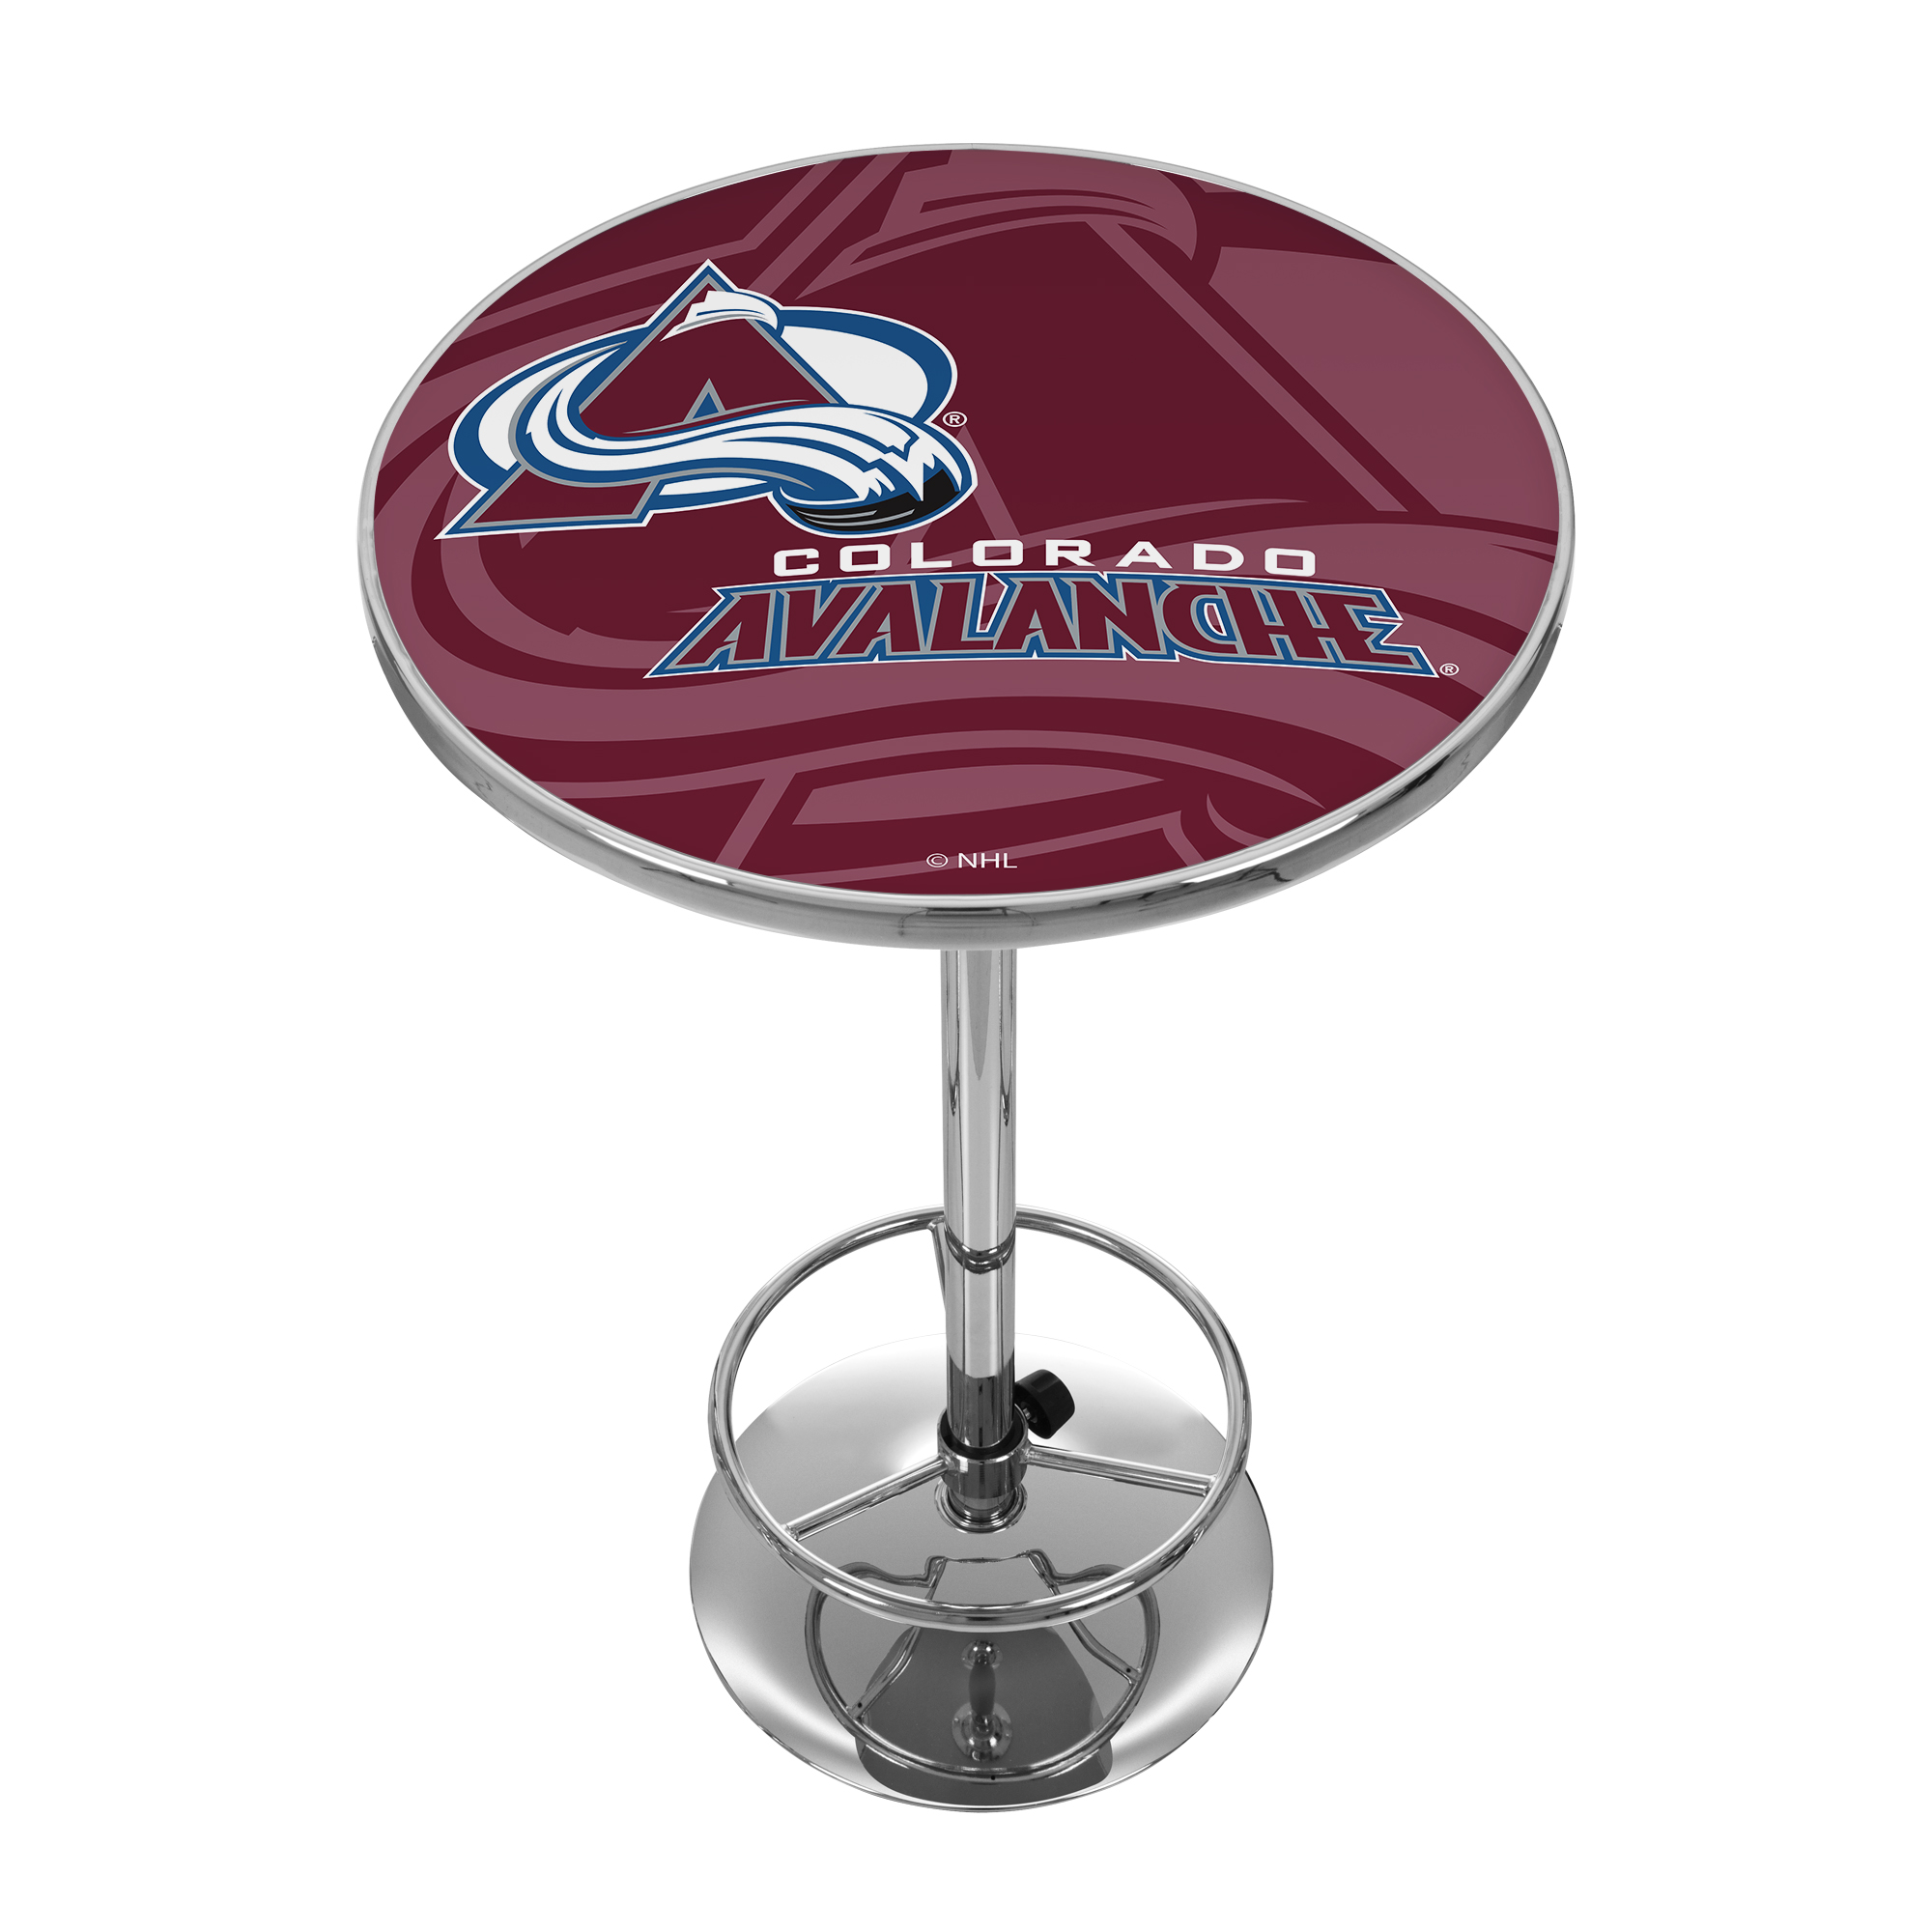 NHL Chrome Pub Table - Watermark - Colorado Avalanche